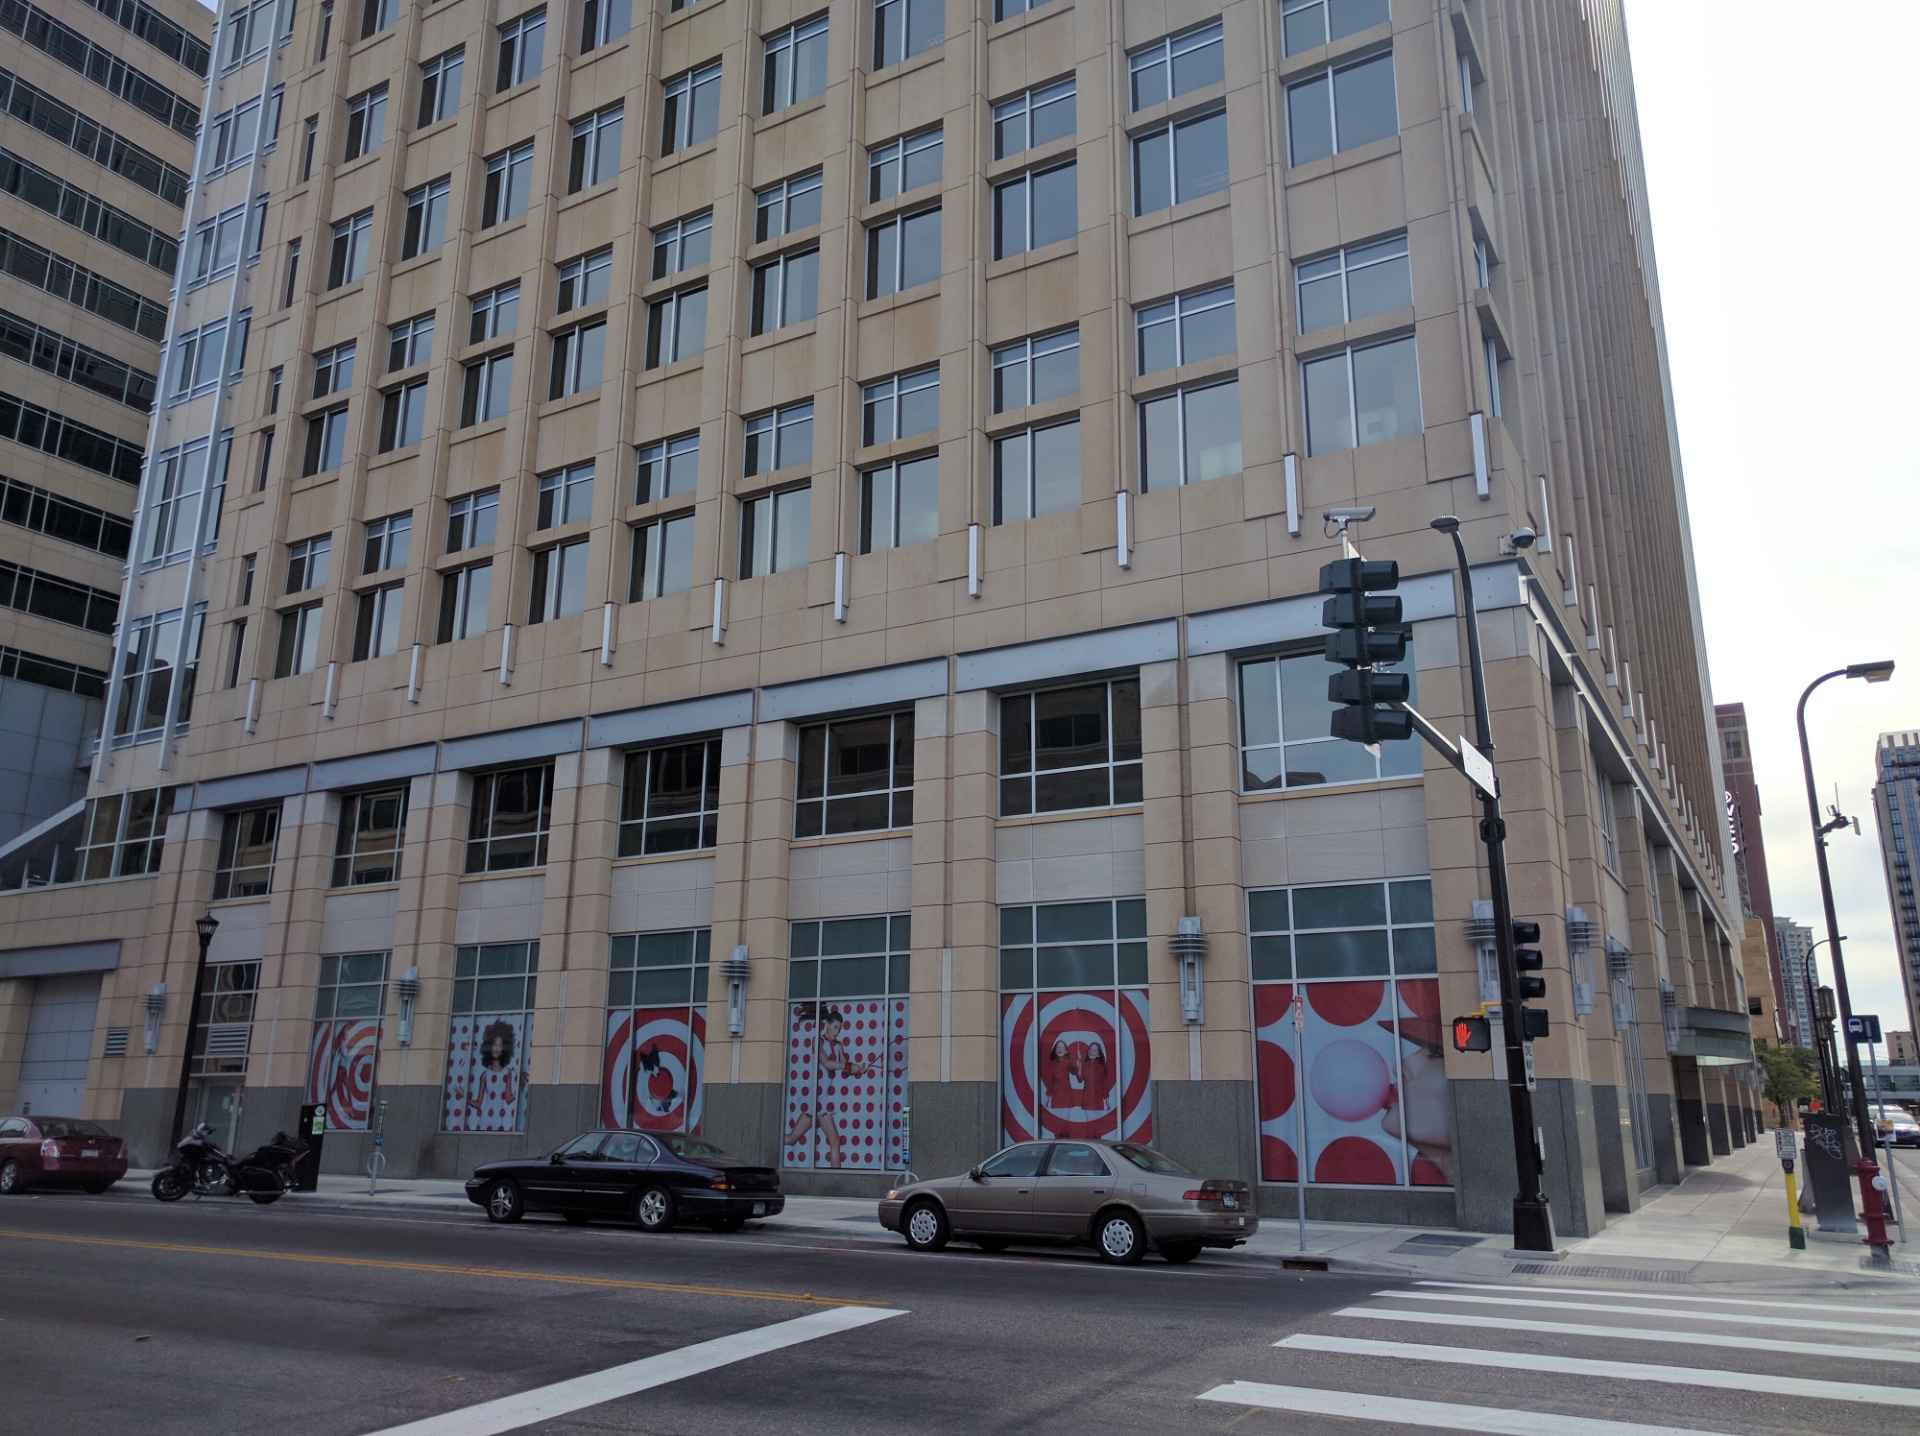 Target's corporate headquarters in downtown Minneapolis, Minnesota.